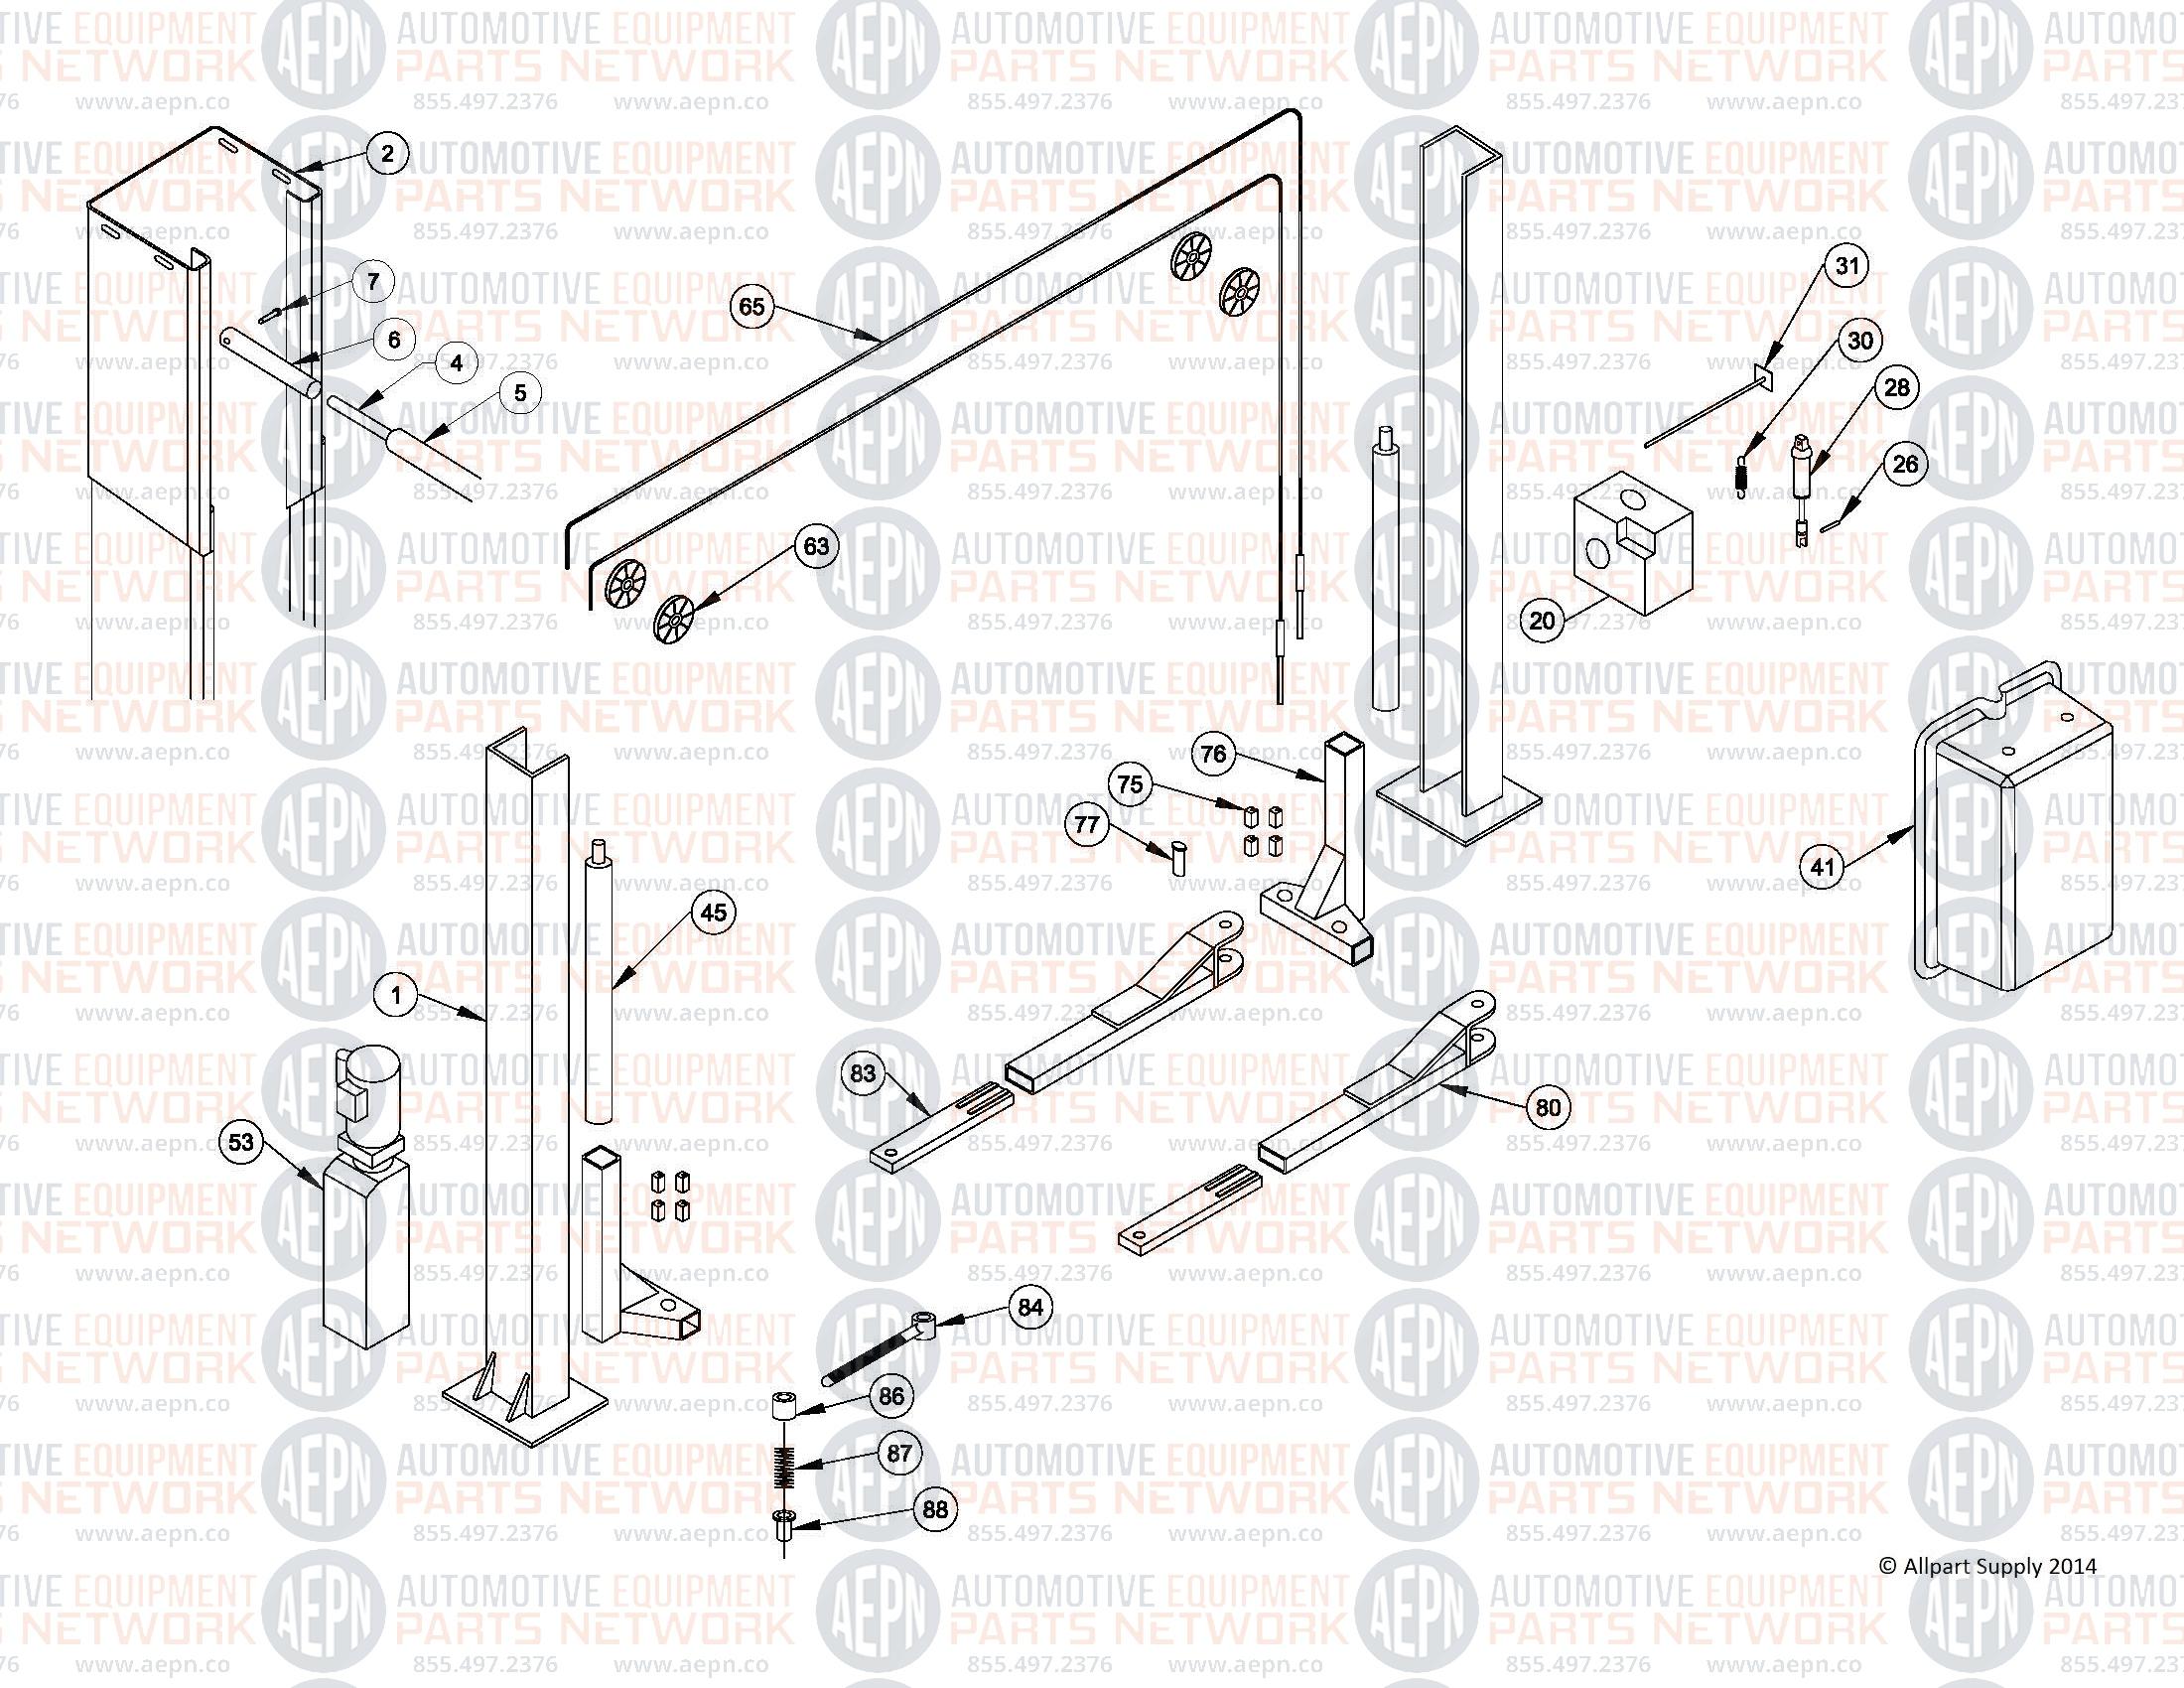 Challenger Parts Diagram Worksheet And Wiring Pentair 12002 Breakdown Rh Aepn Co Crosman Lift